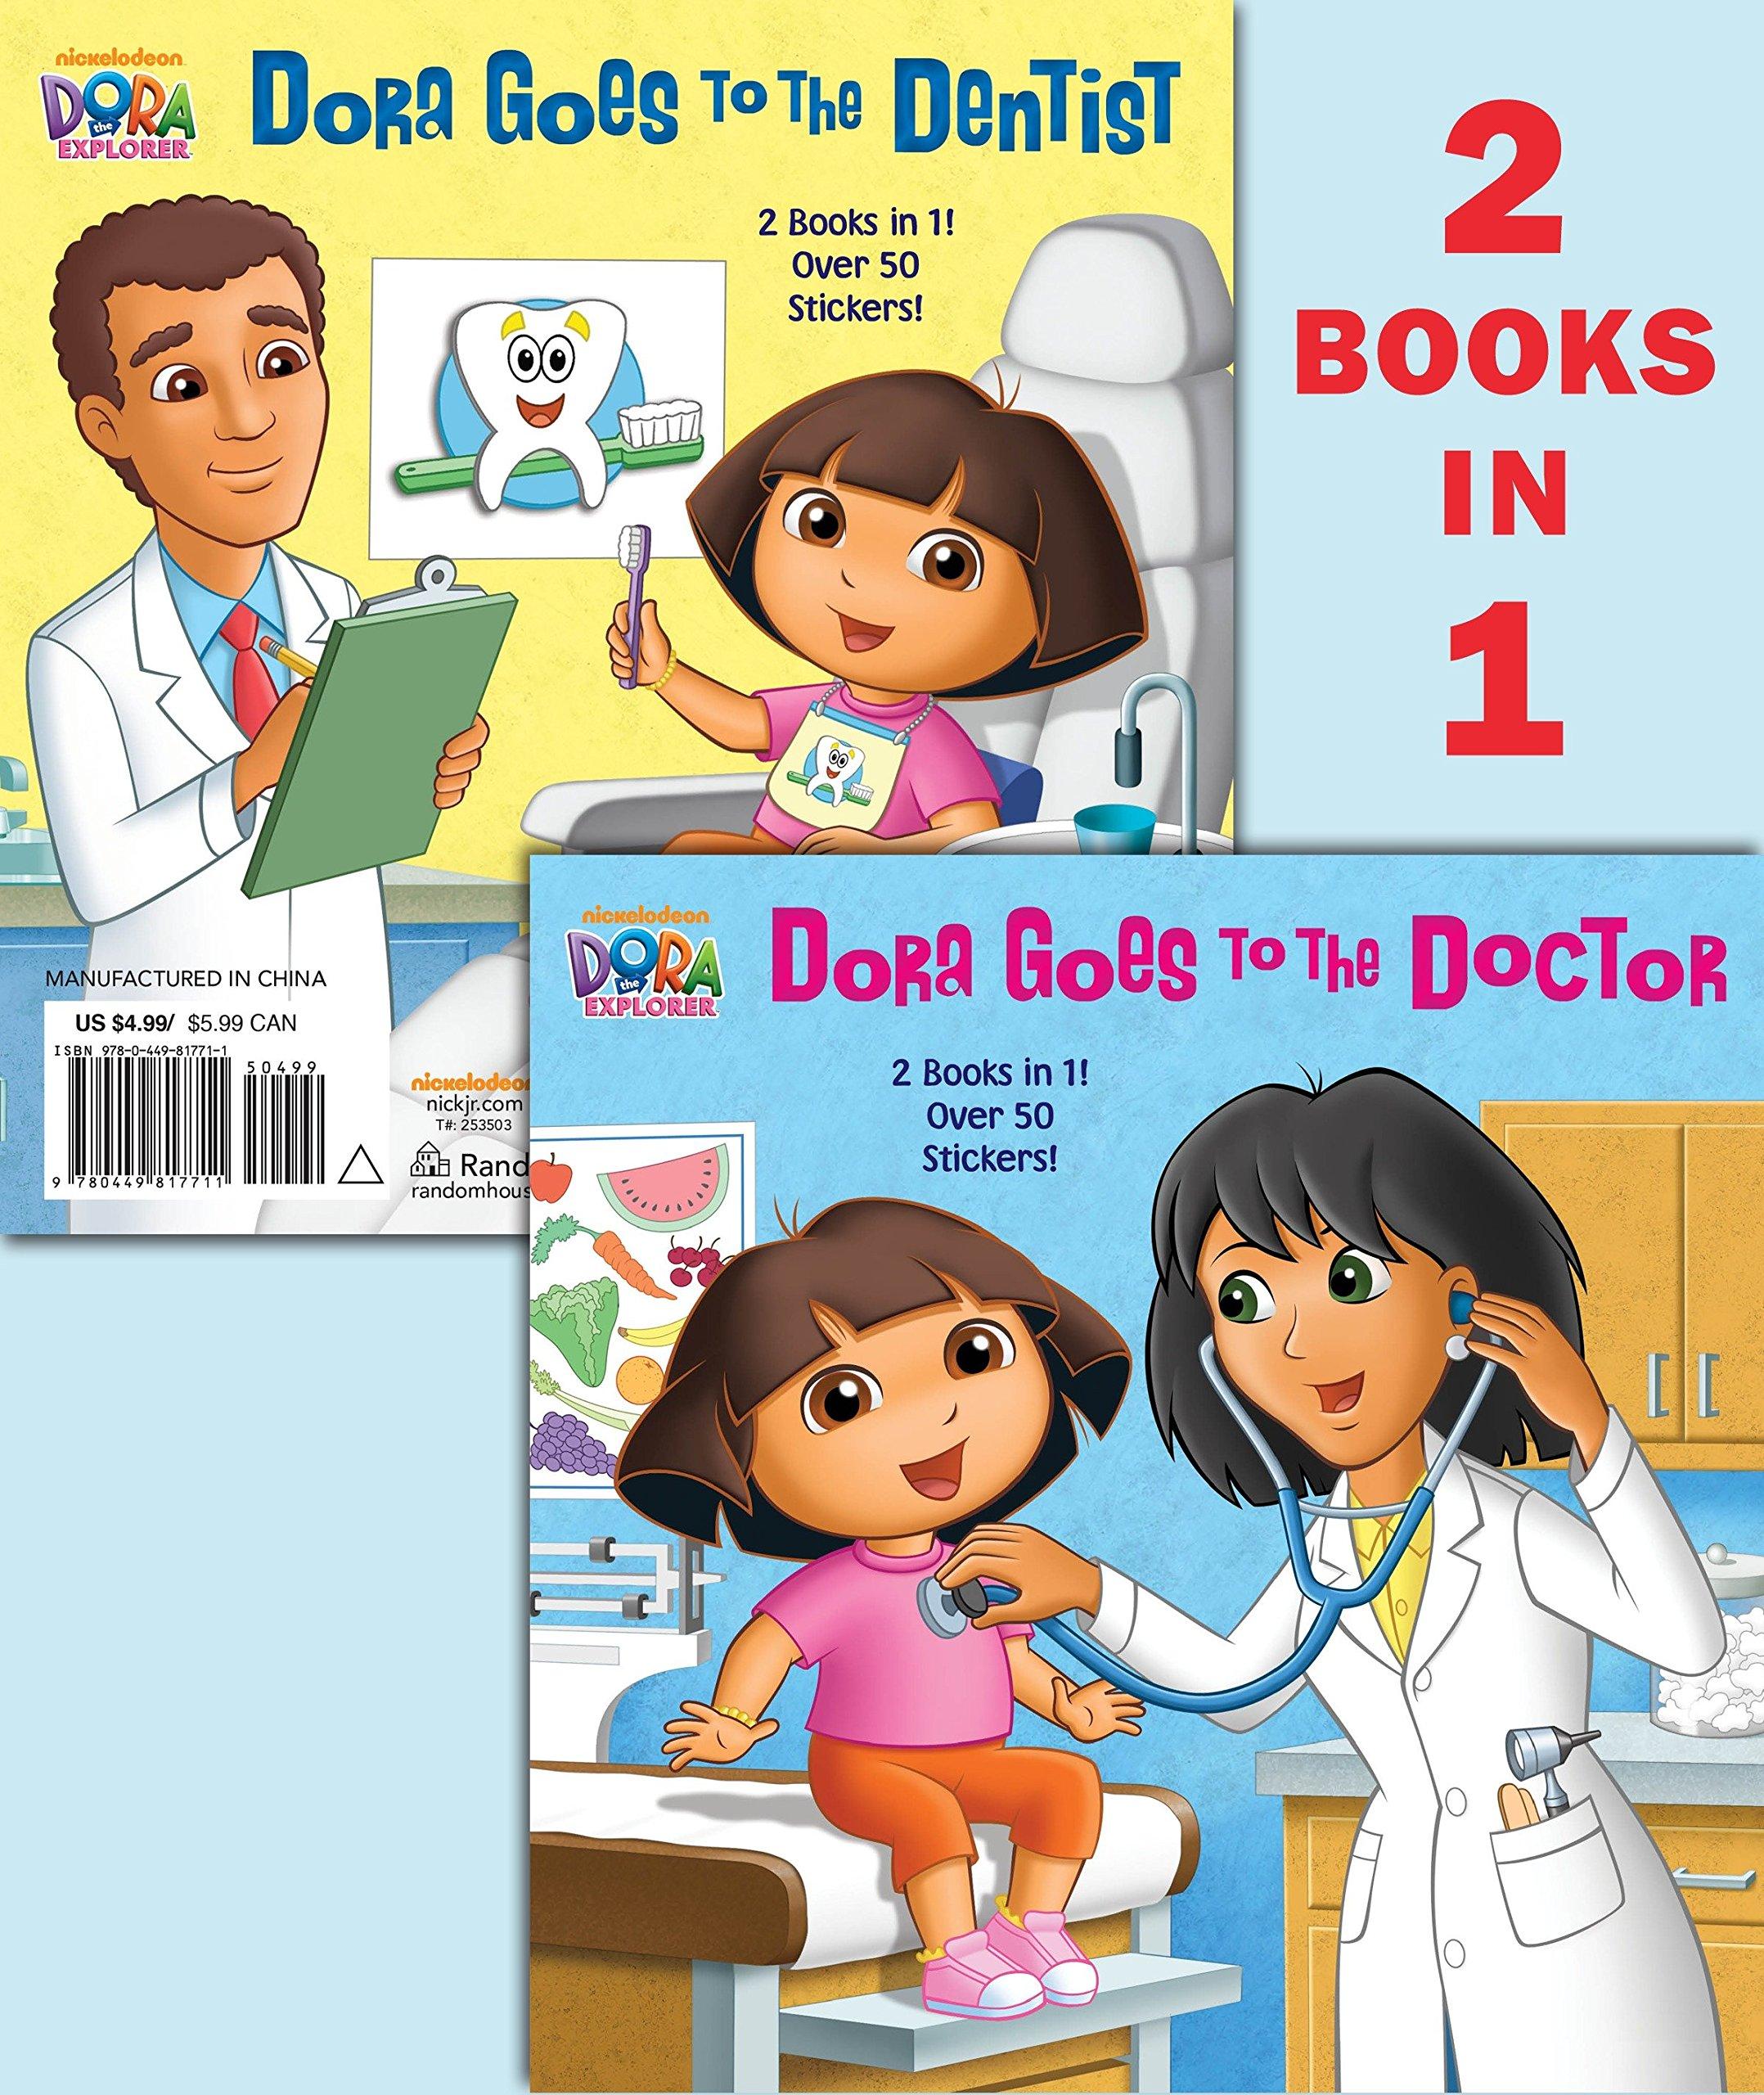 Dora the Explorer Dora Goes to the Doctor//Dora Goes to the Dentist